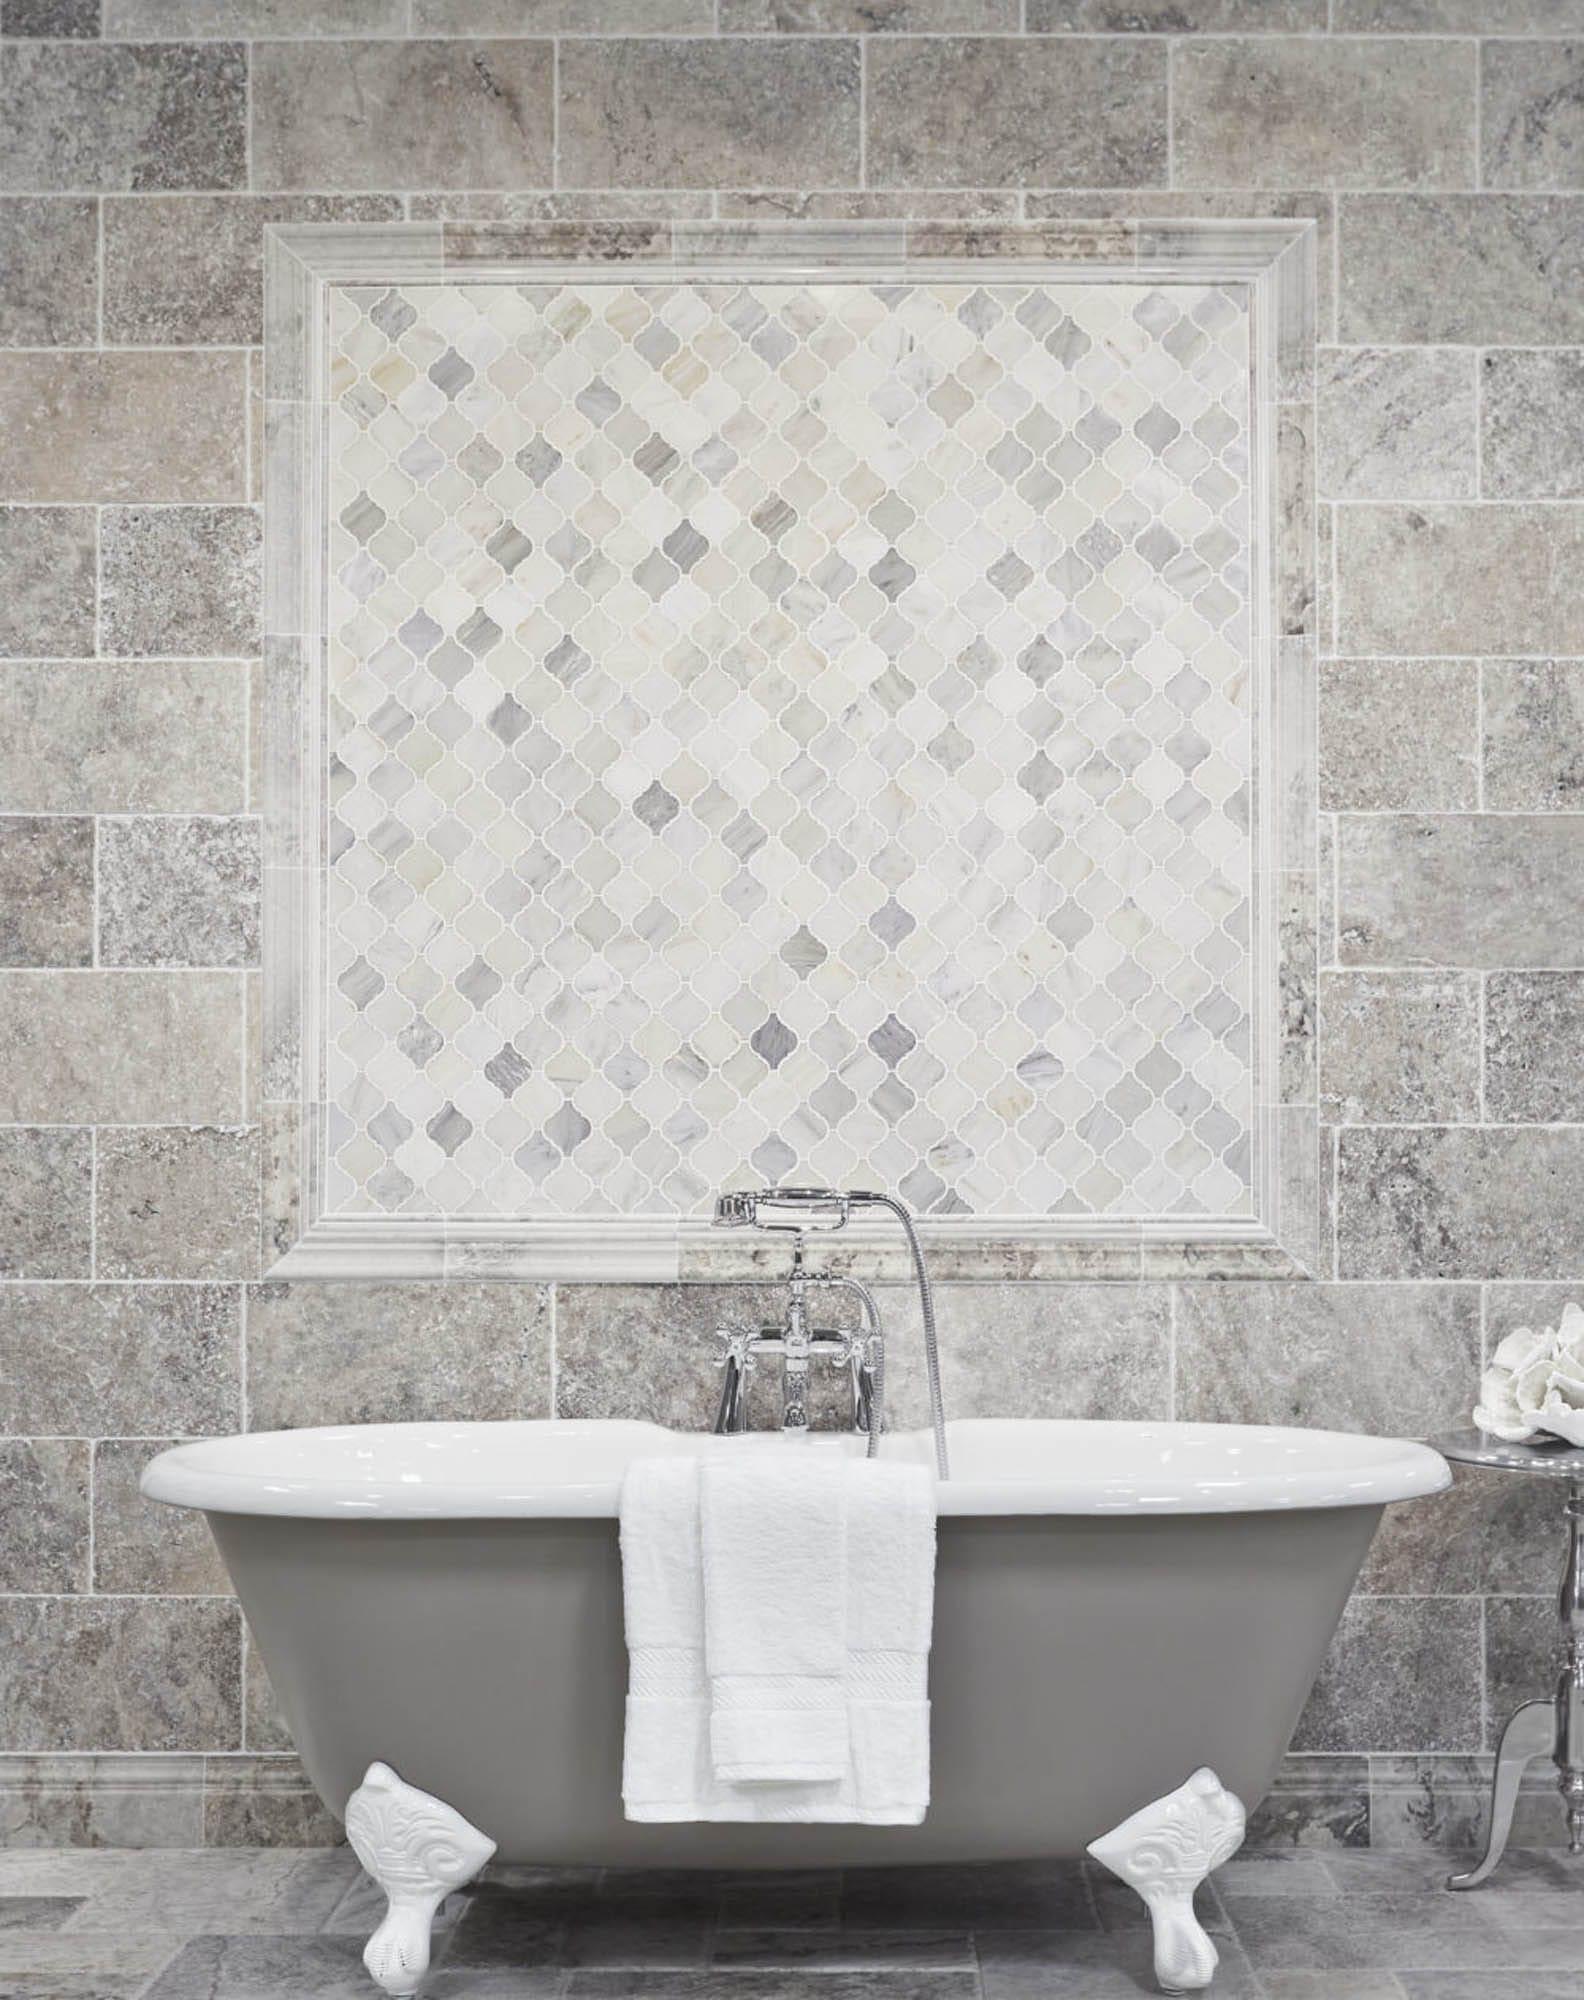 Tumbled finish stone bathroom